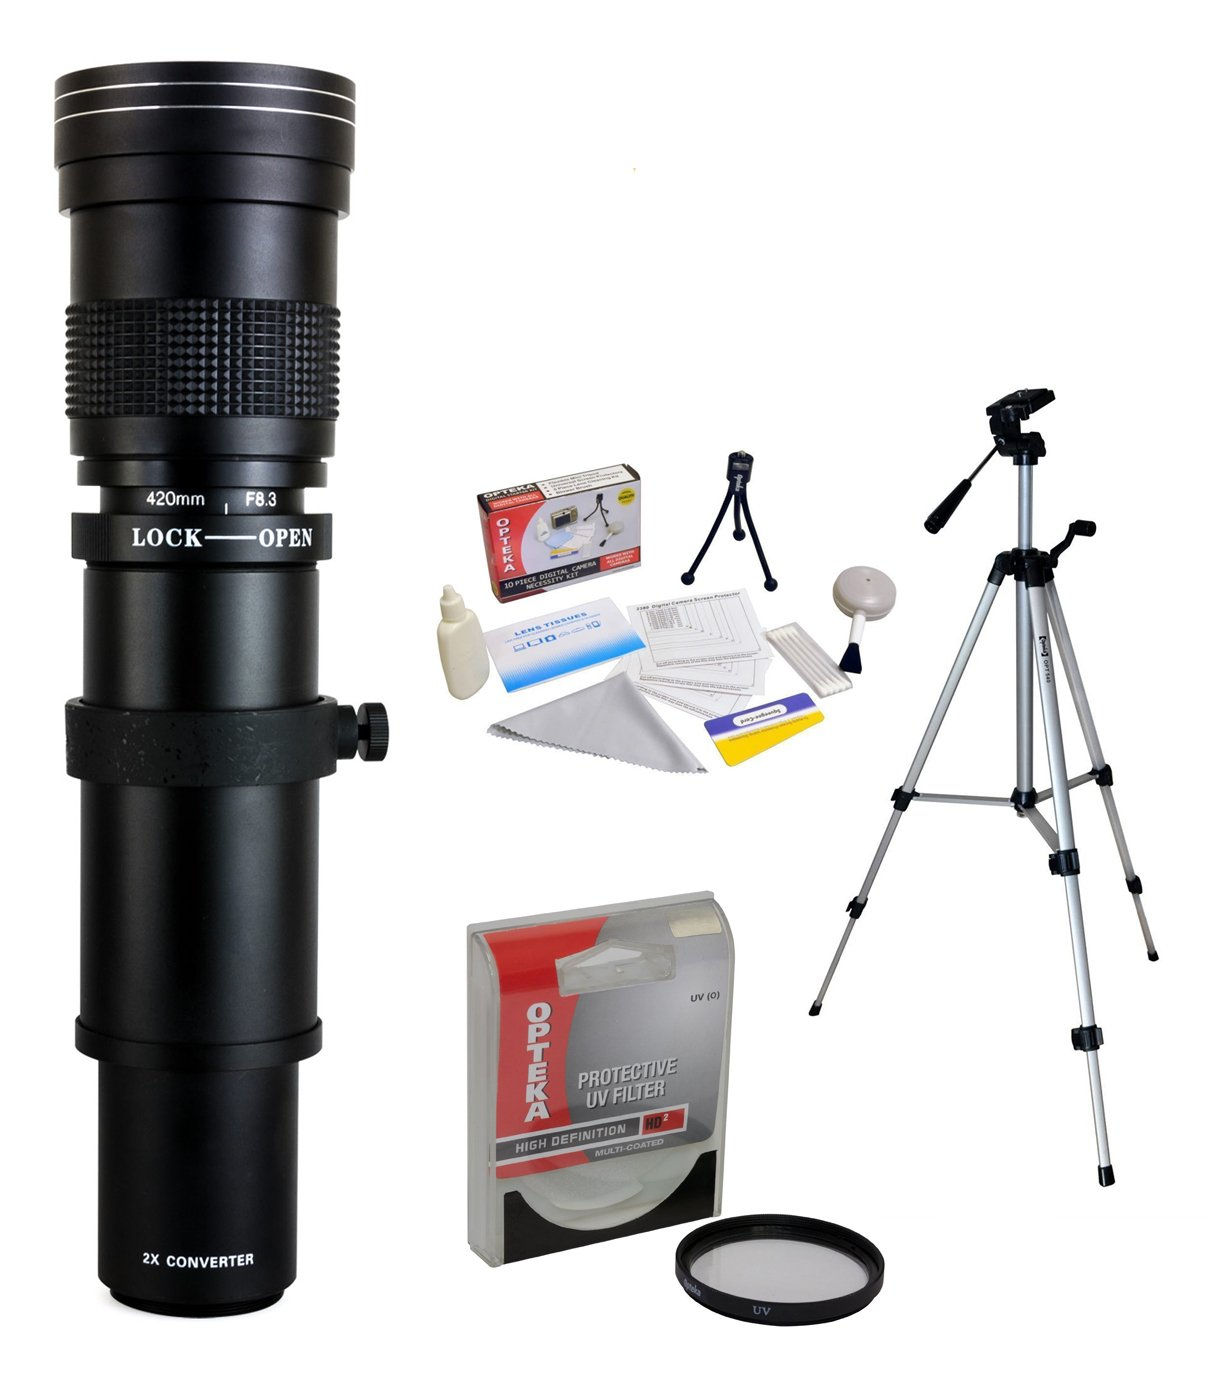 Opteka 420 – 800 mm f / 8.3望遠レンズUVフィルターと三脚付きSony Alpha a99 , a77 , a65 , a58 , a57 , a55 , a37 , a35 , a33 , a900 , a700 , a580 , a560 , a550 , a390 , a380、a330、a290デジタルSLRカメラ B00OPBXE12